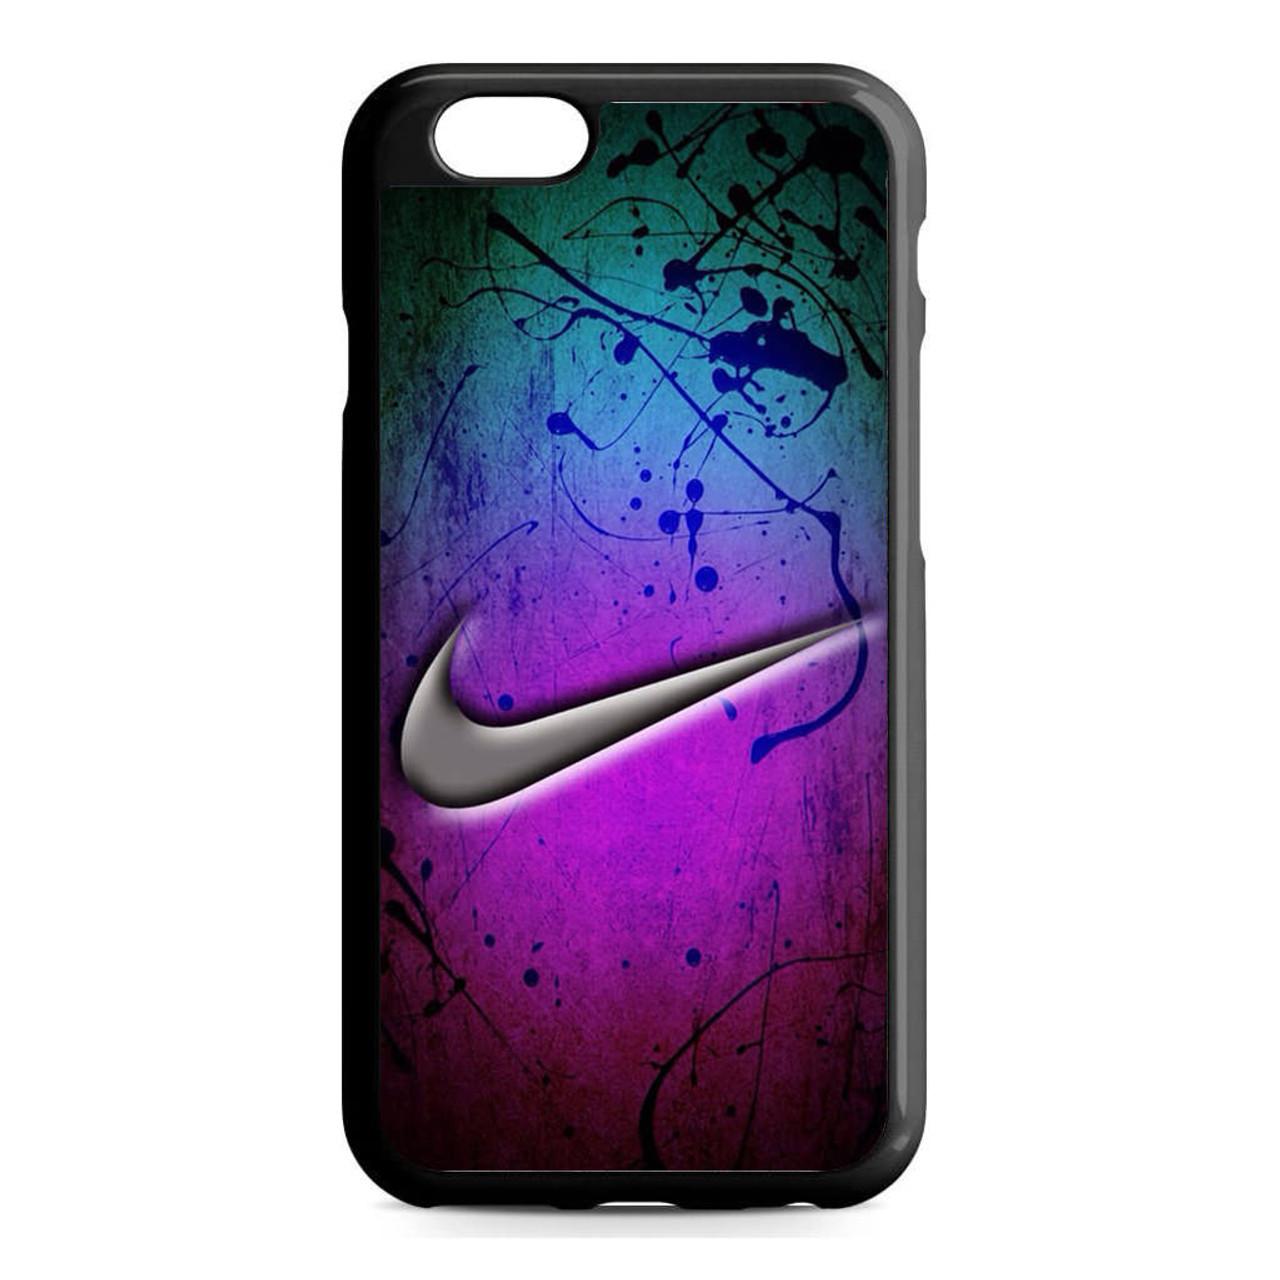 da7d46c0b439 Nike Holographic Style iPhone 6 6S Case - GGIANS